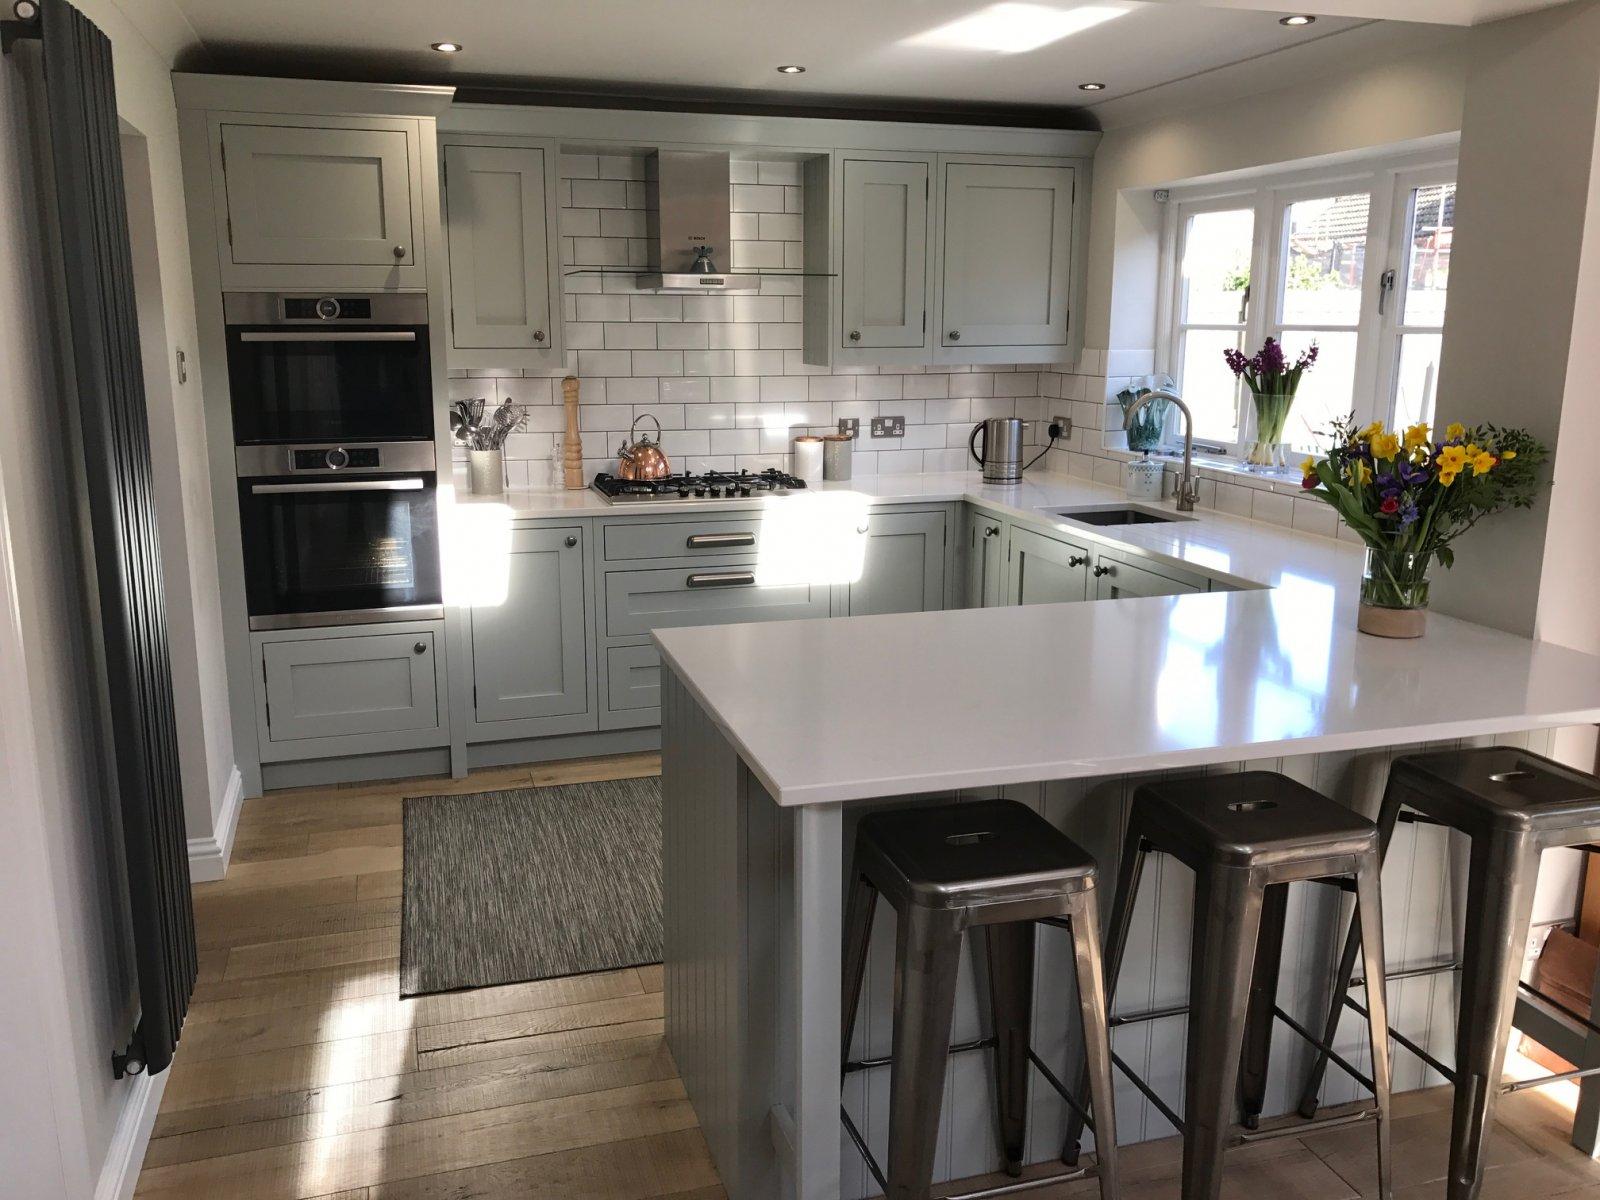 1909 Shaker Partridge Grey Concept Kitchens